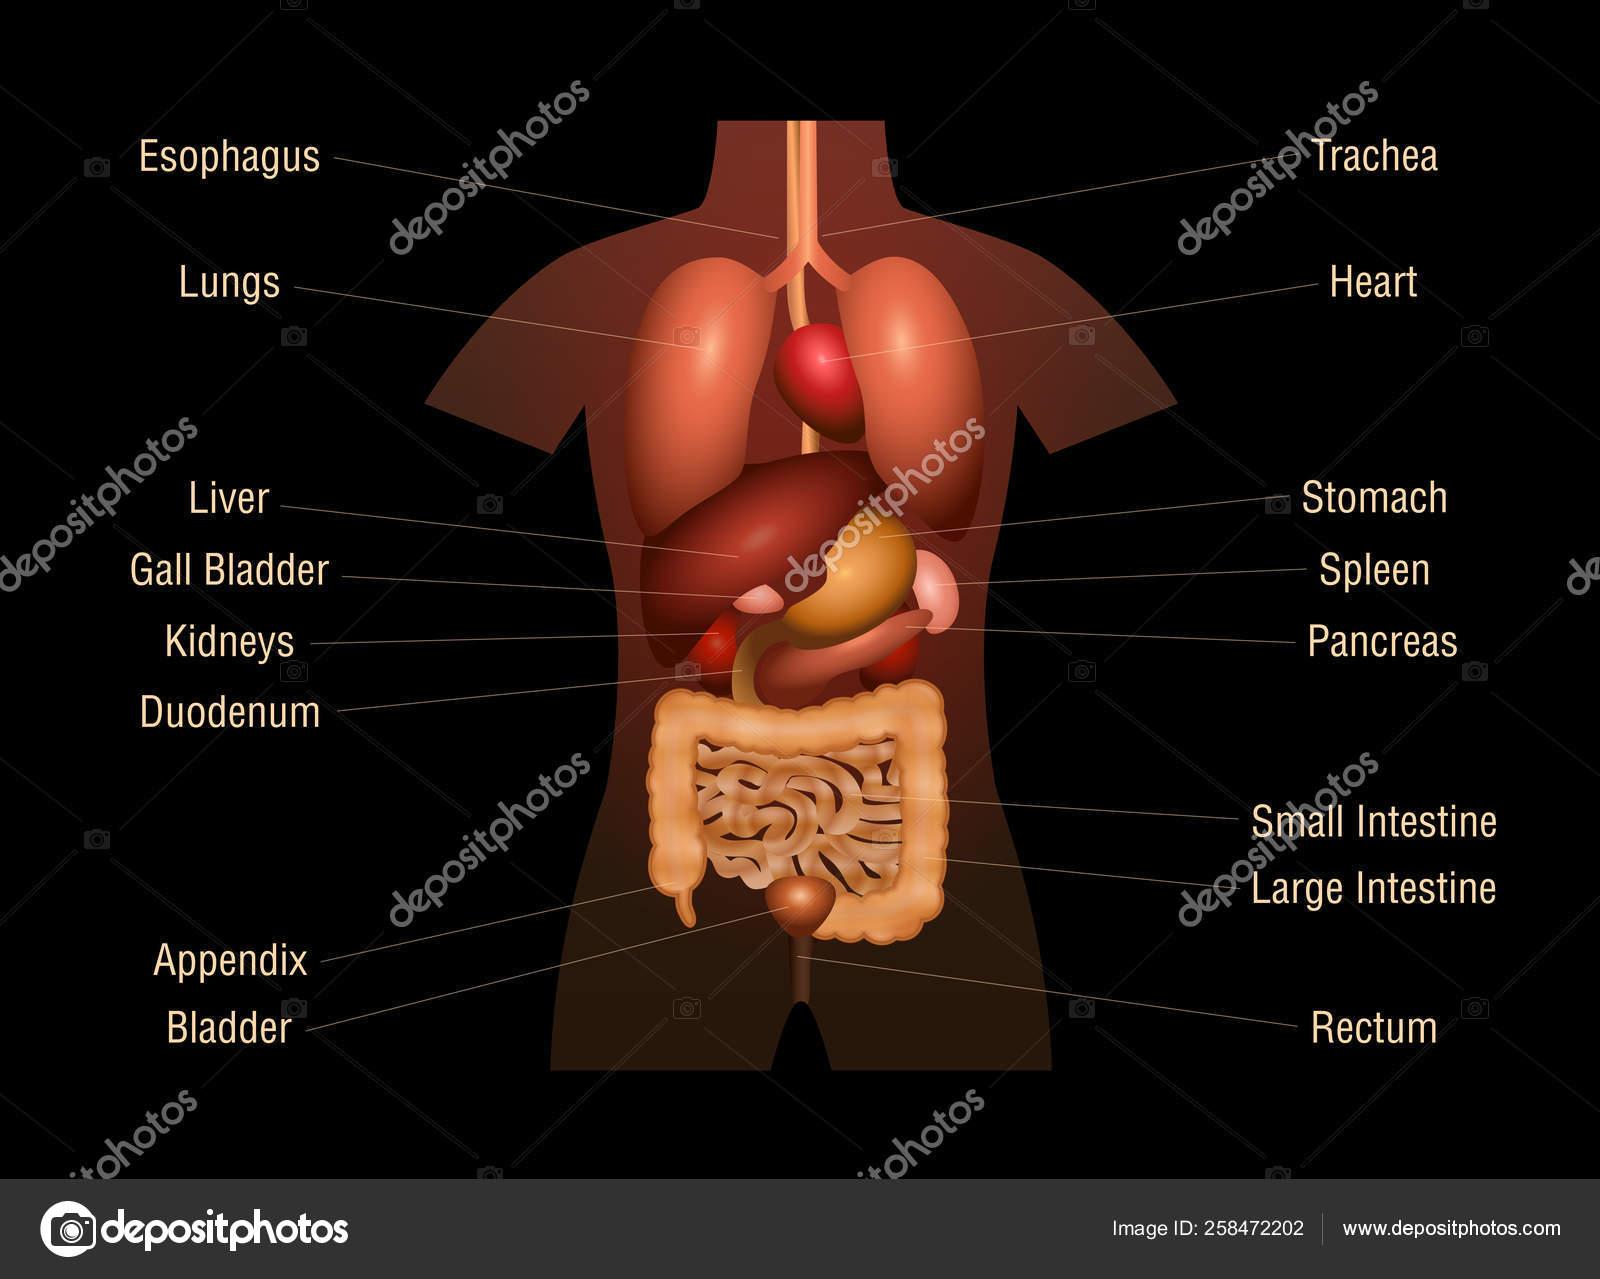 Internal Organs Human Anatomy Chart Names 3d Vector Image By C Furian Vector Stock 258472202